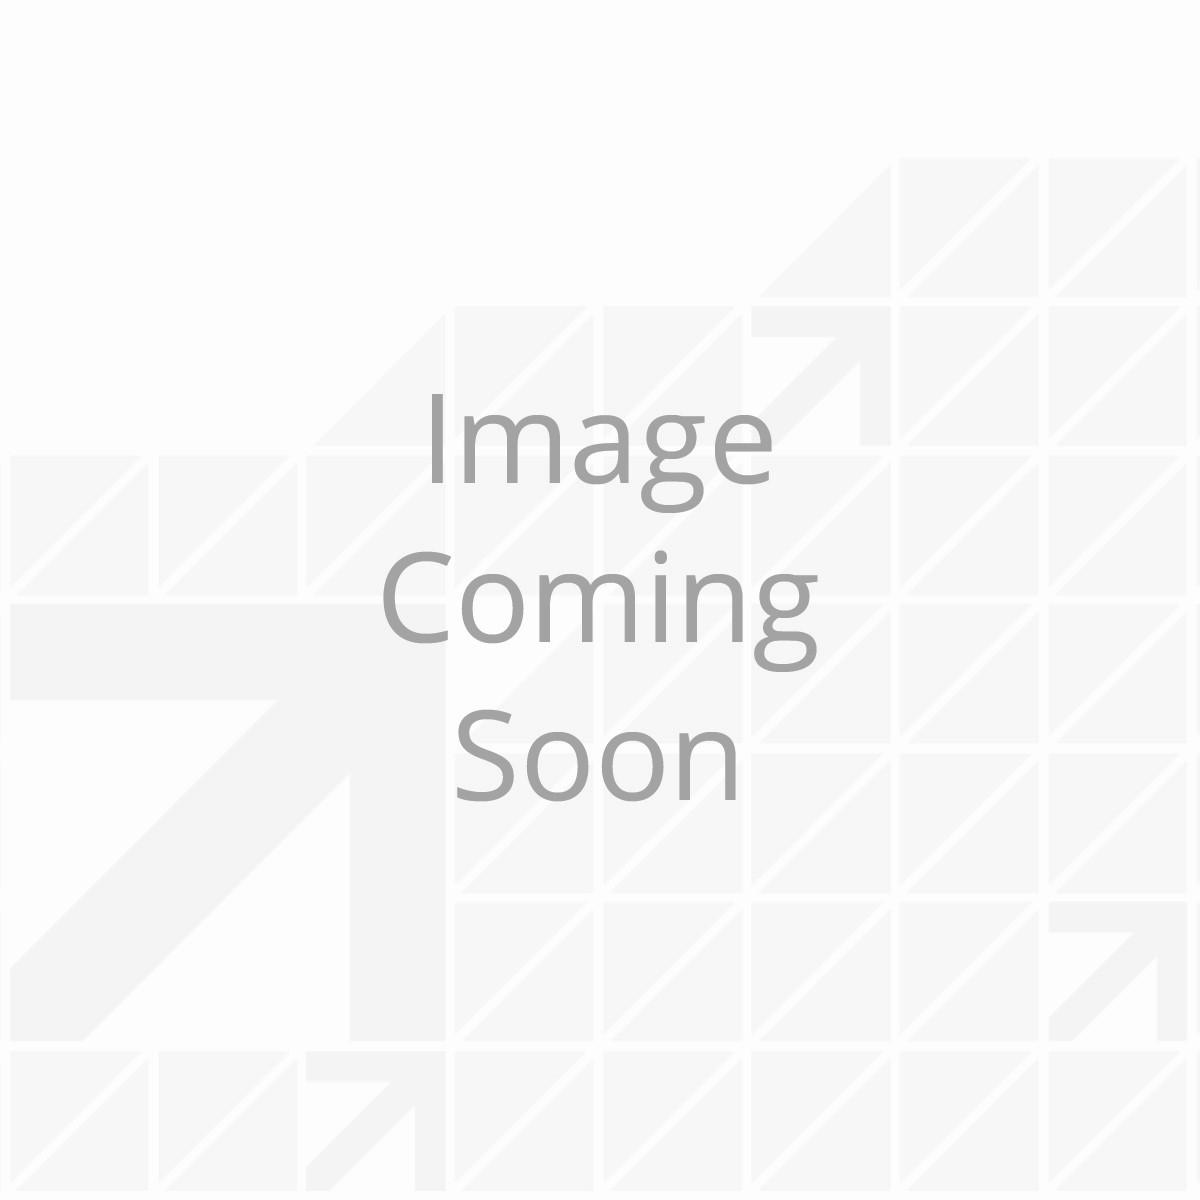 FT-CG07 Chevy/GMC Tiedown Kit